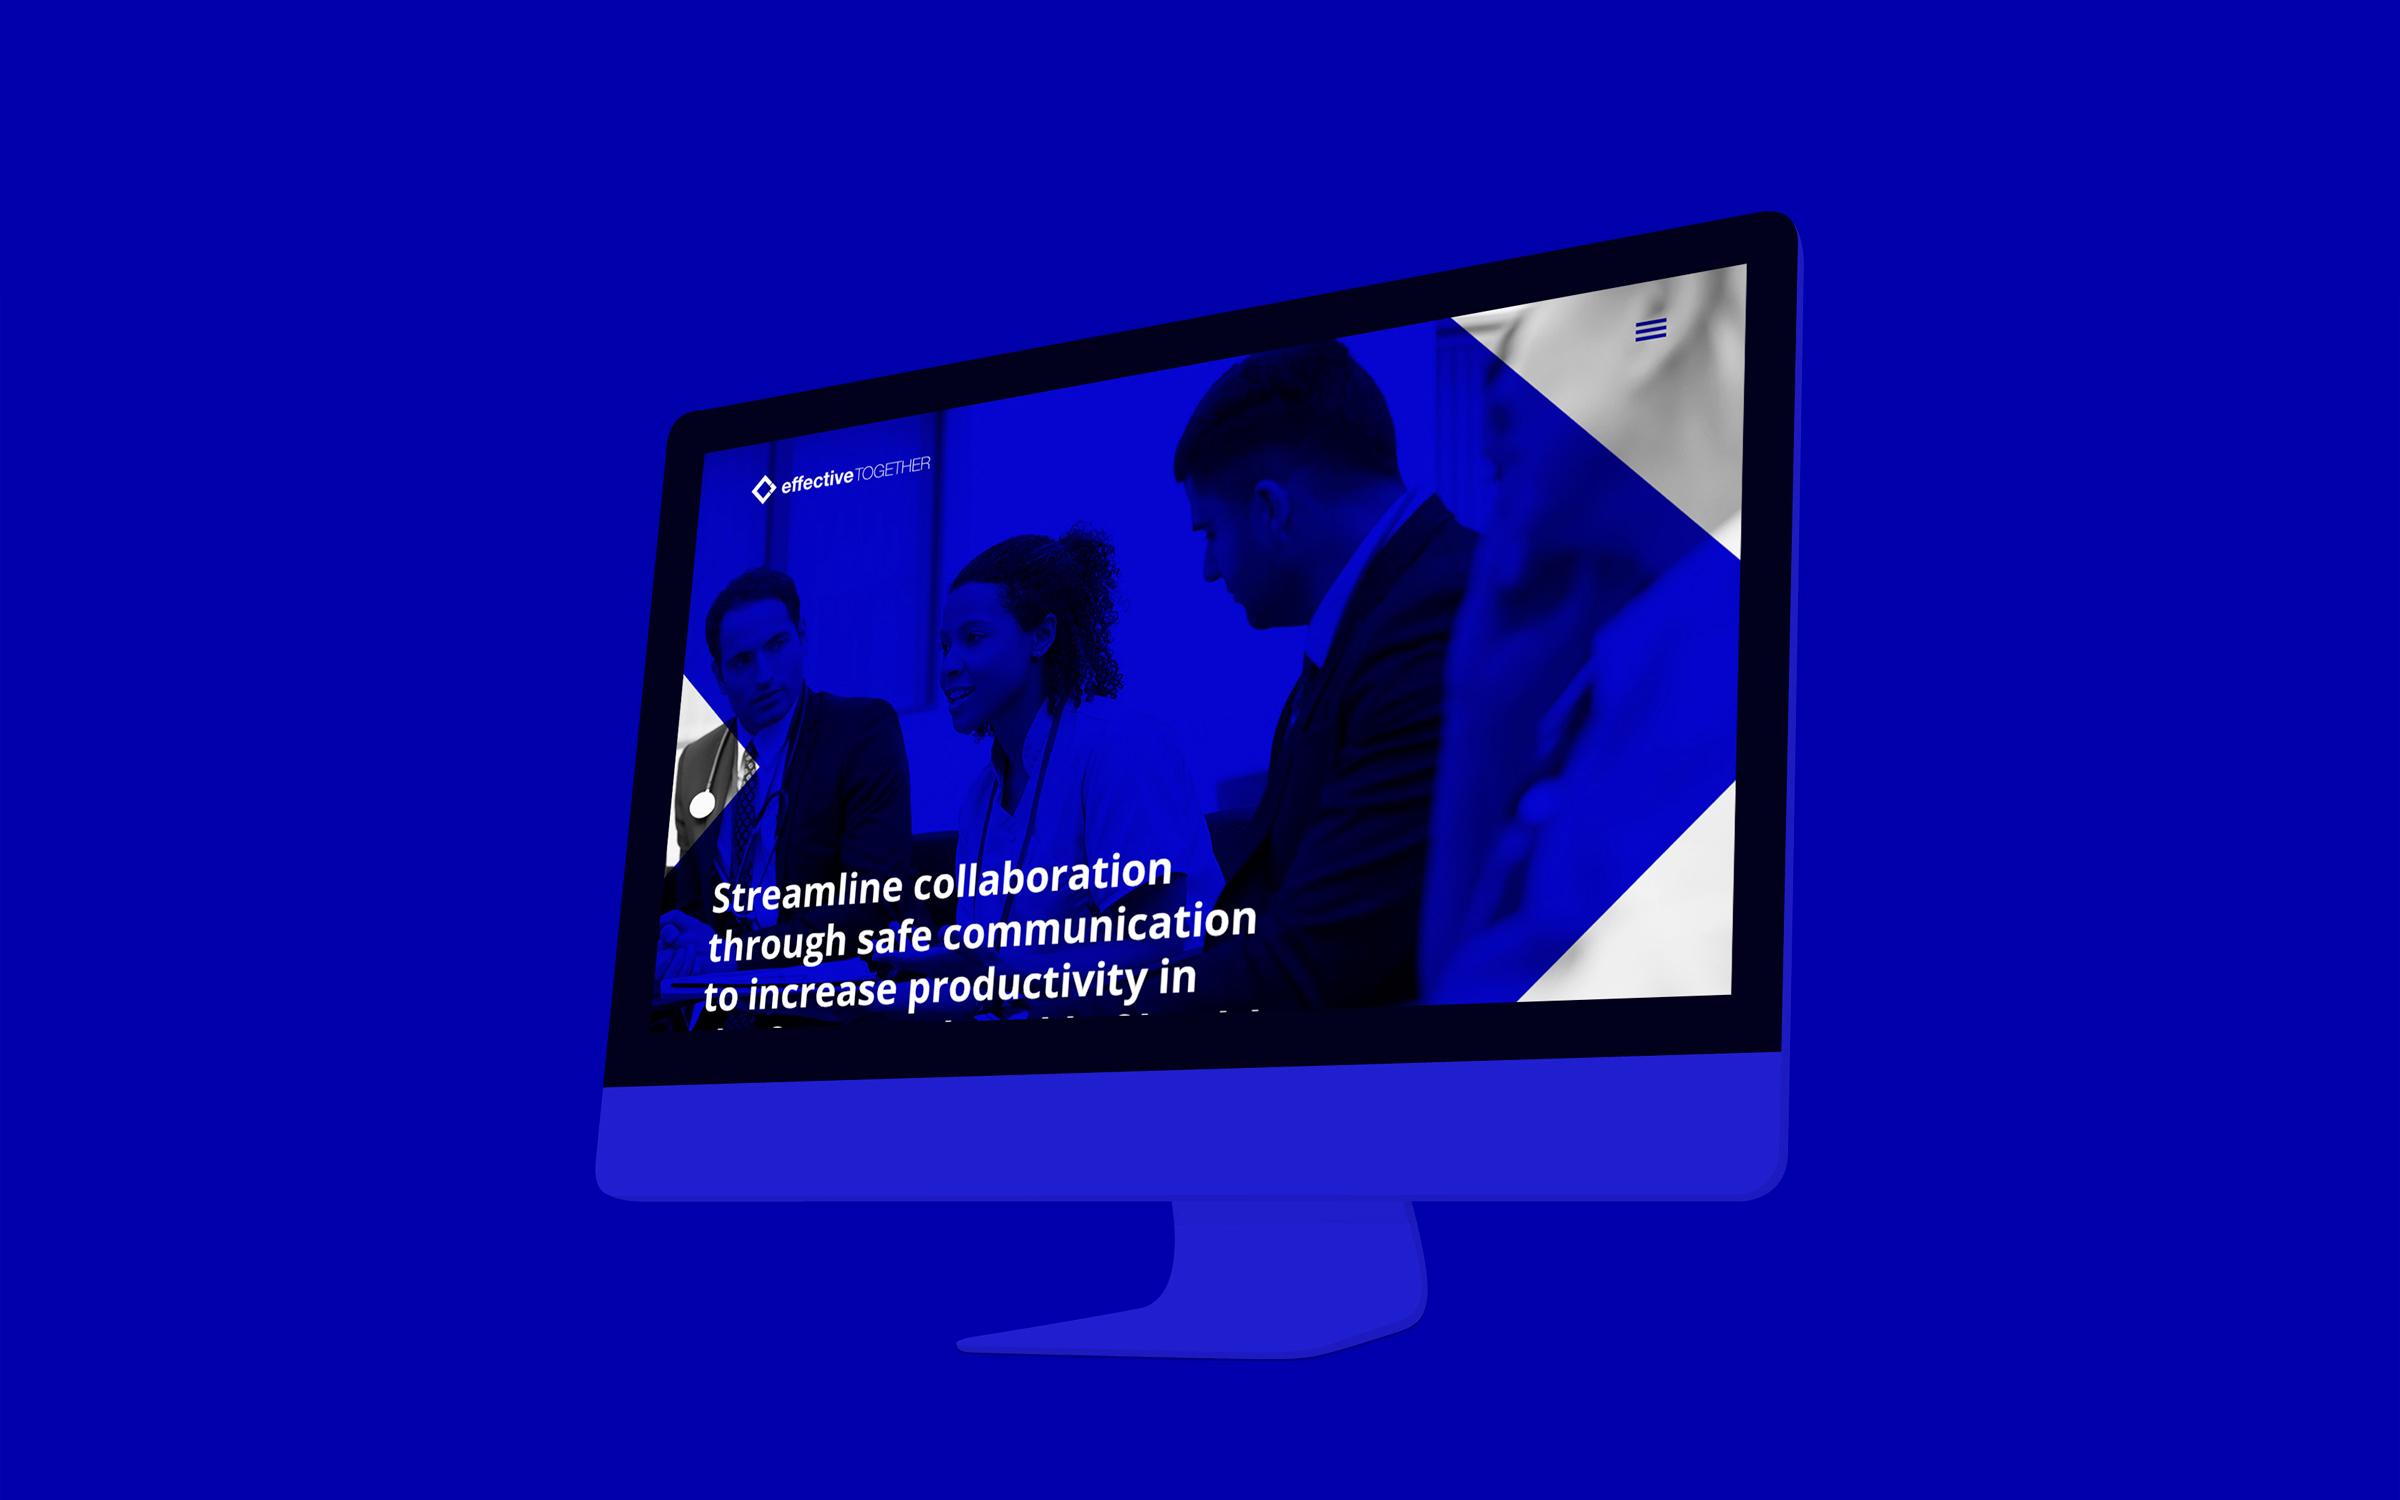 Blue image with website mockup on large computer